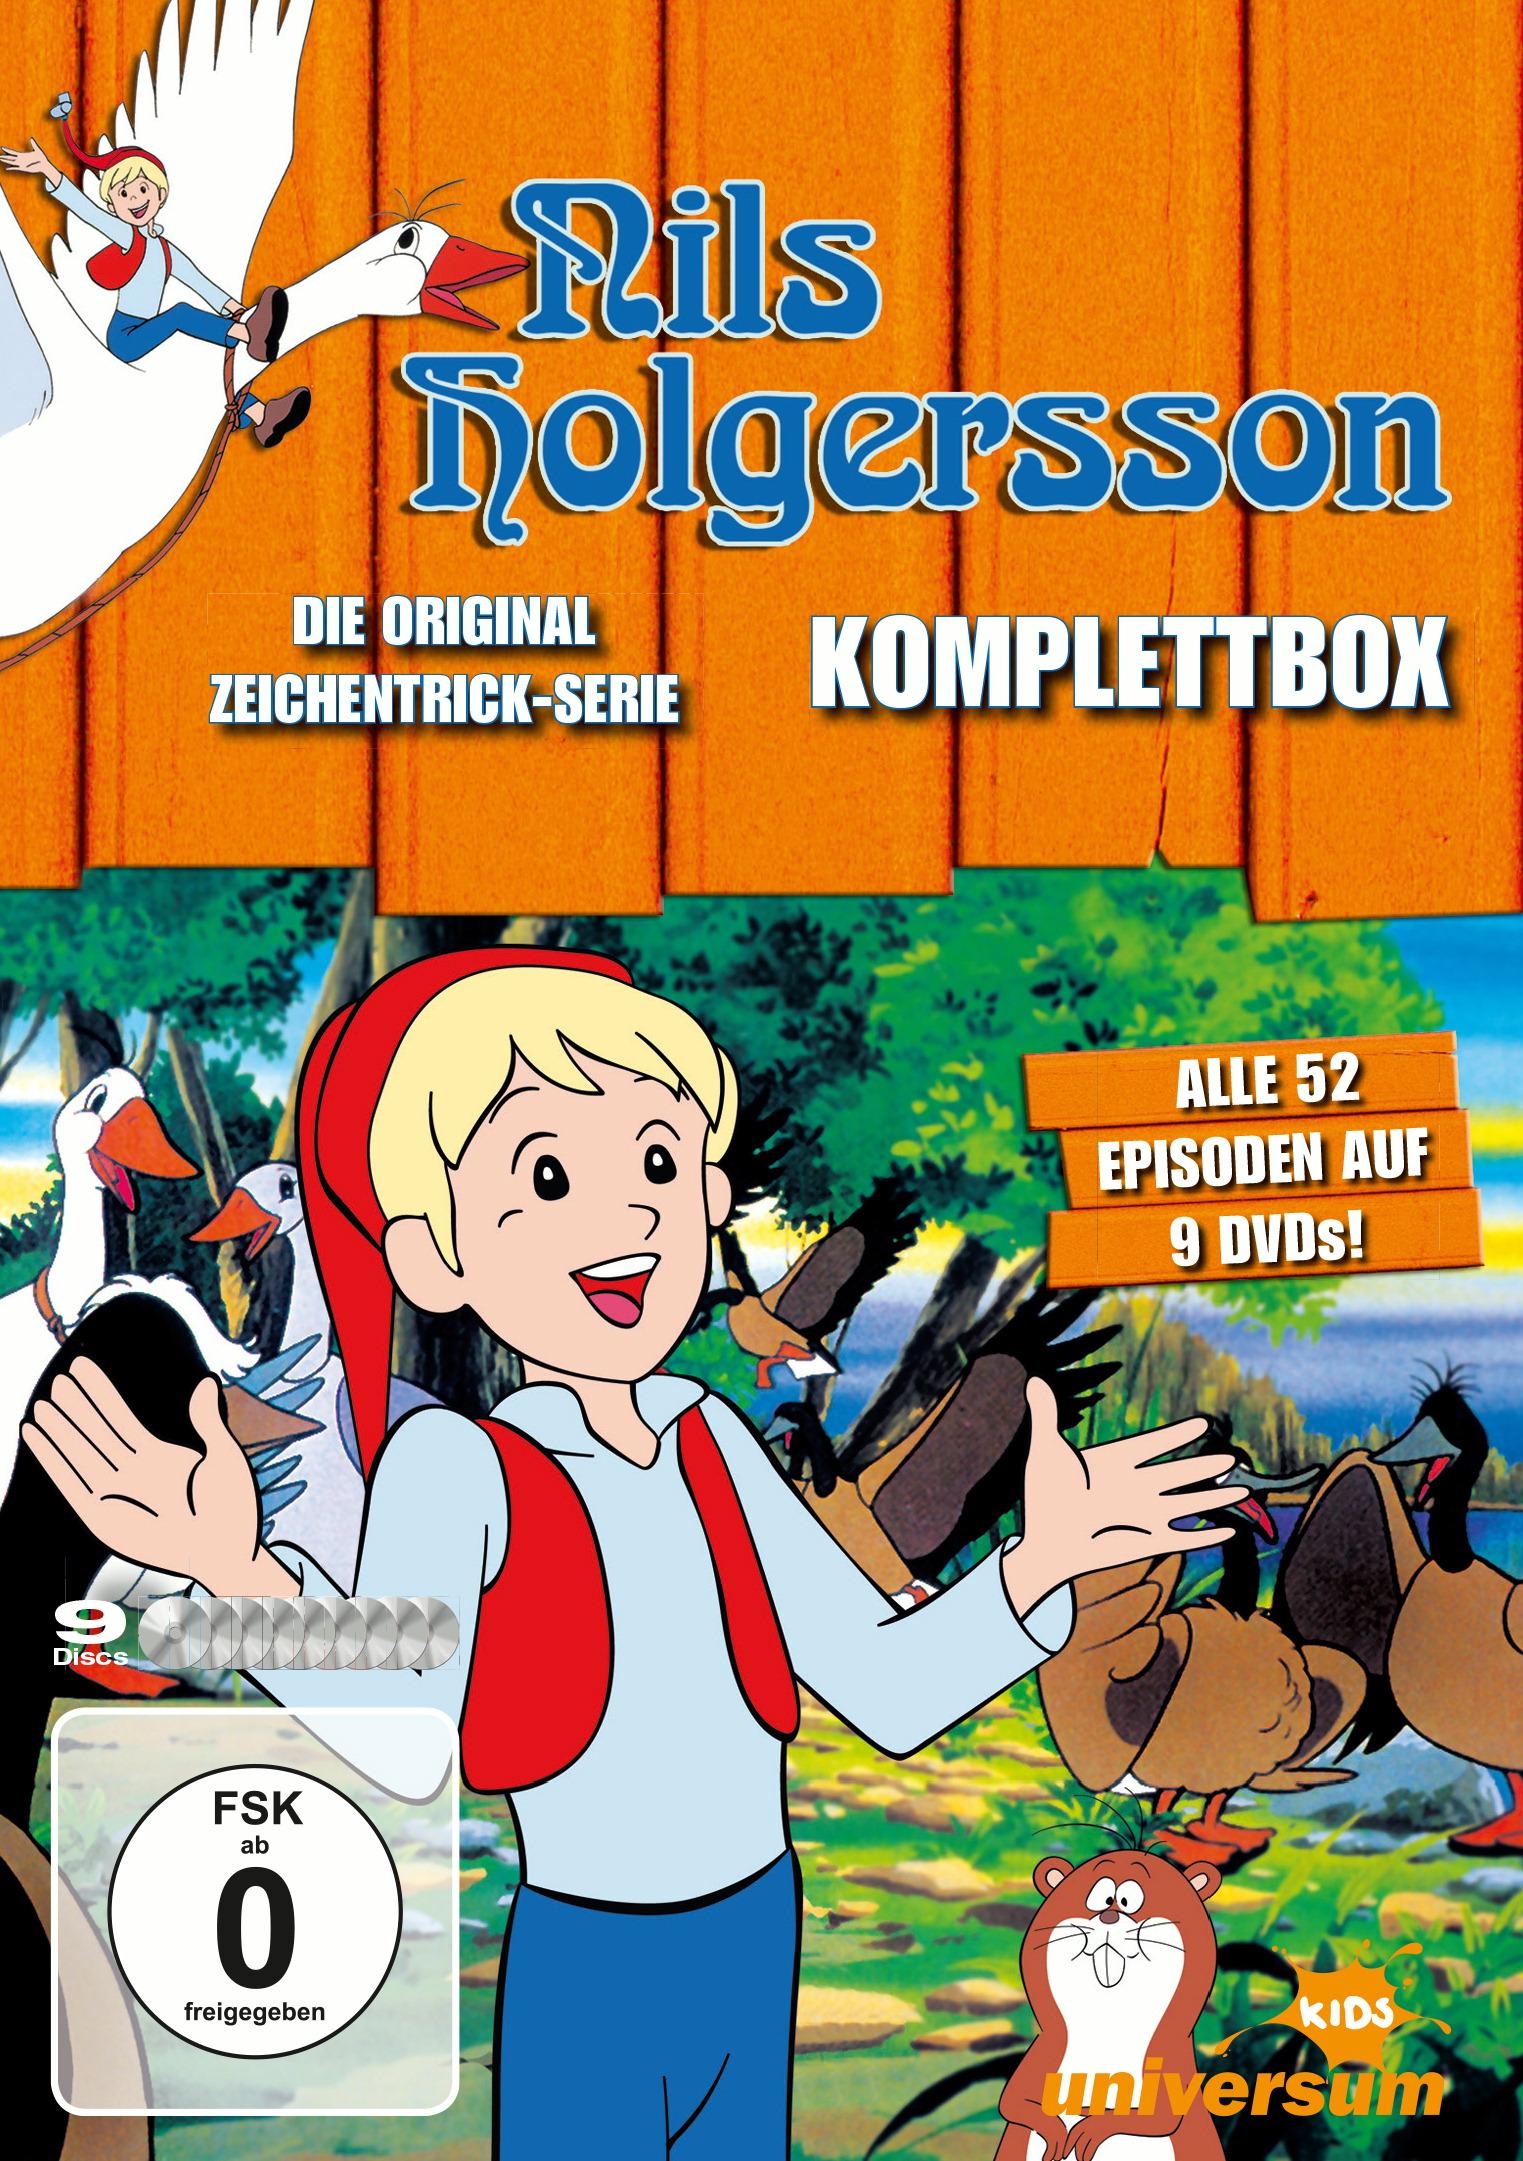 Nils Holgersson - Komplettbox (9 Discs) Poster